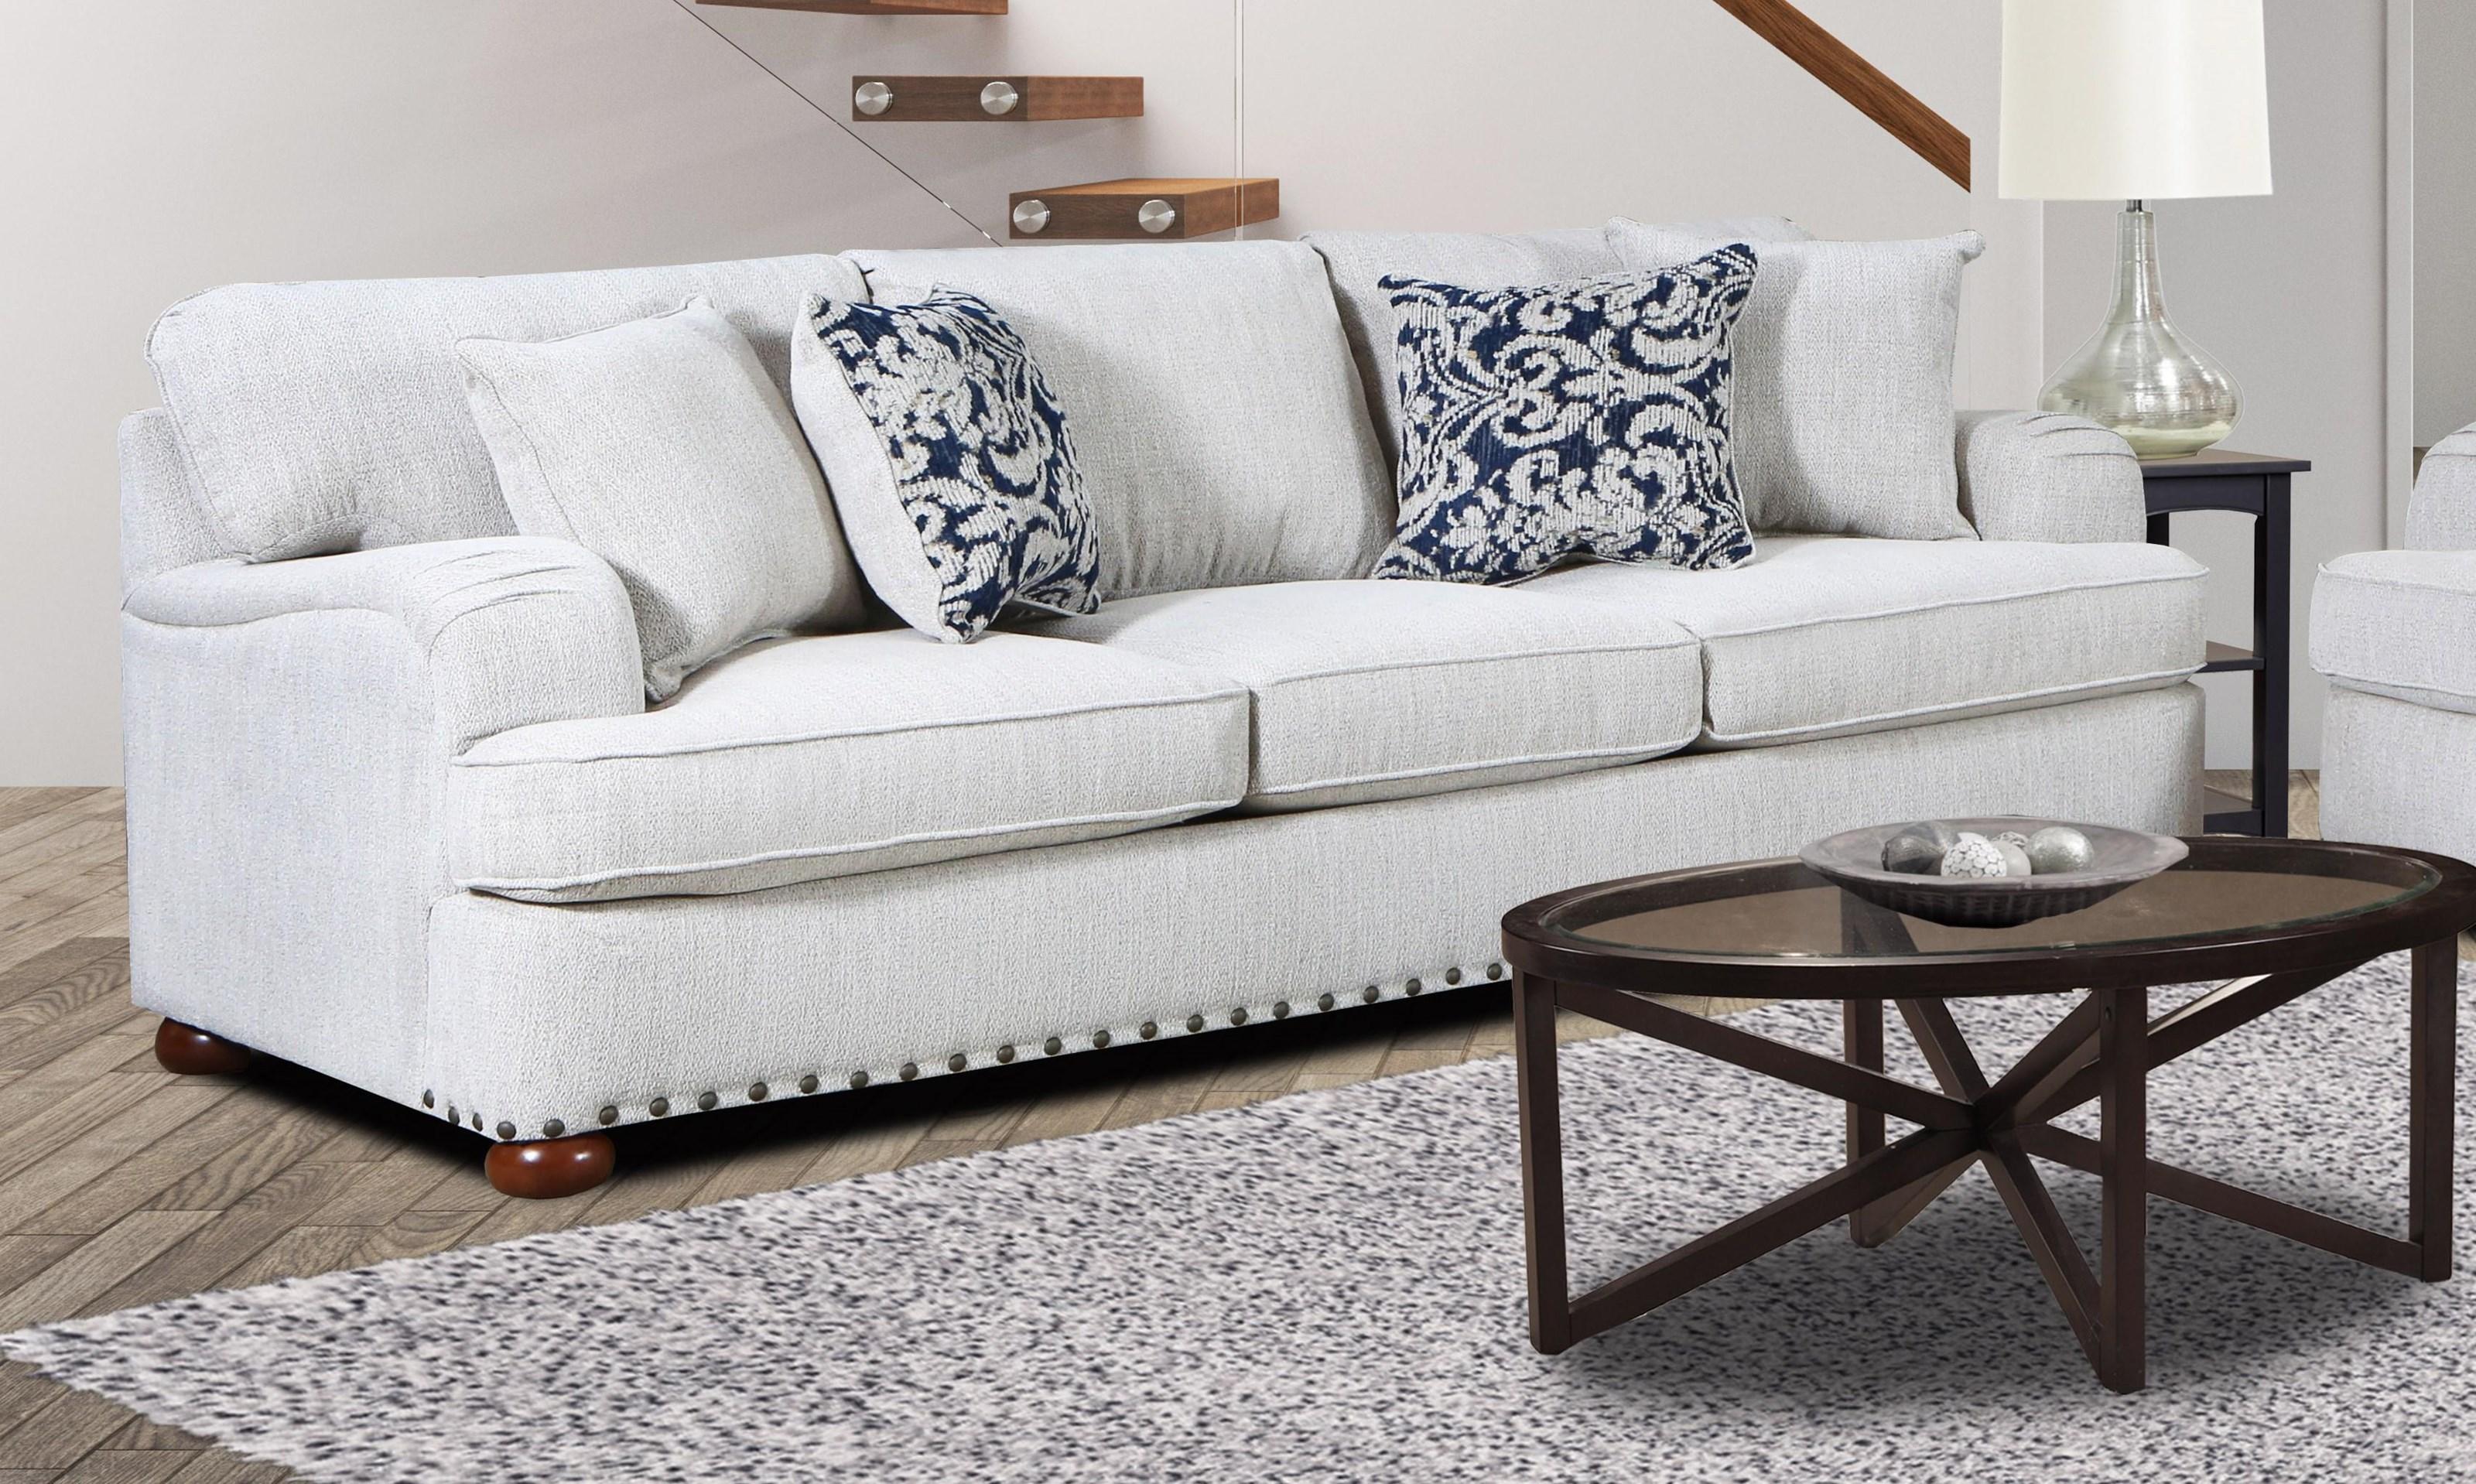 4100 Dixon SOFA by Magnolia Upholstery Design at Furniture Fair - North Carolina